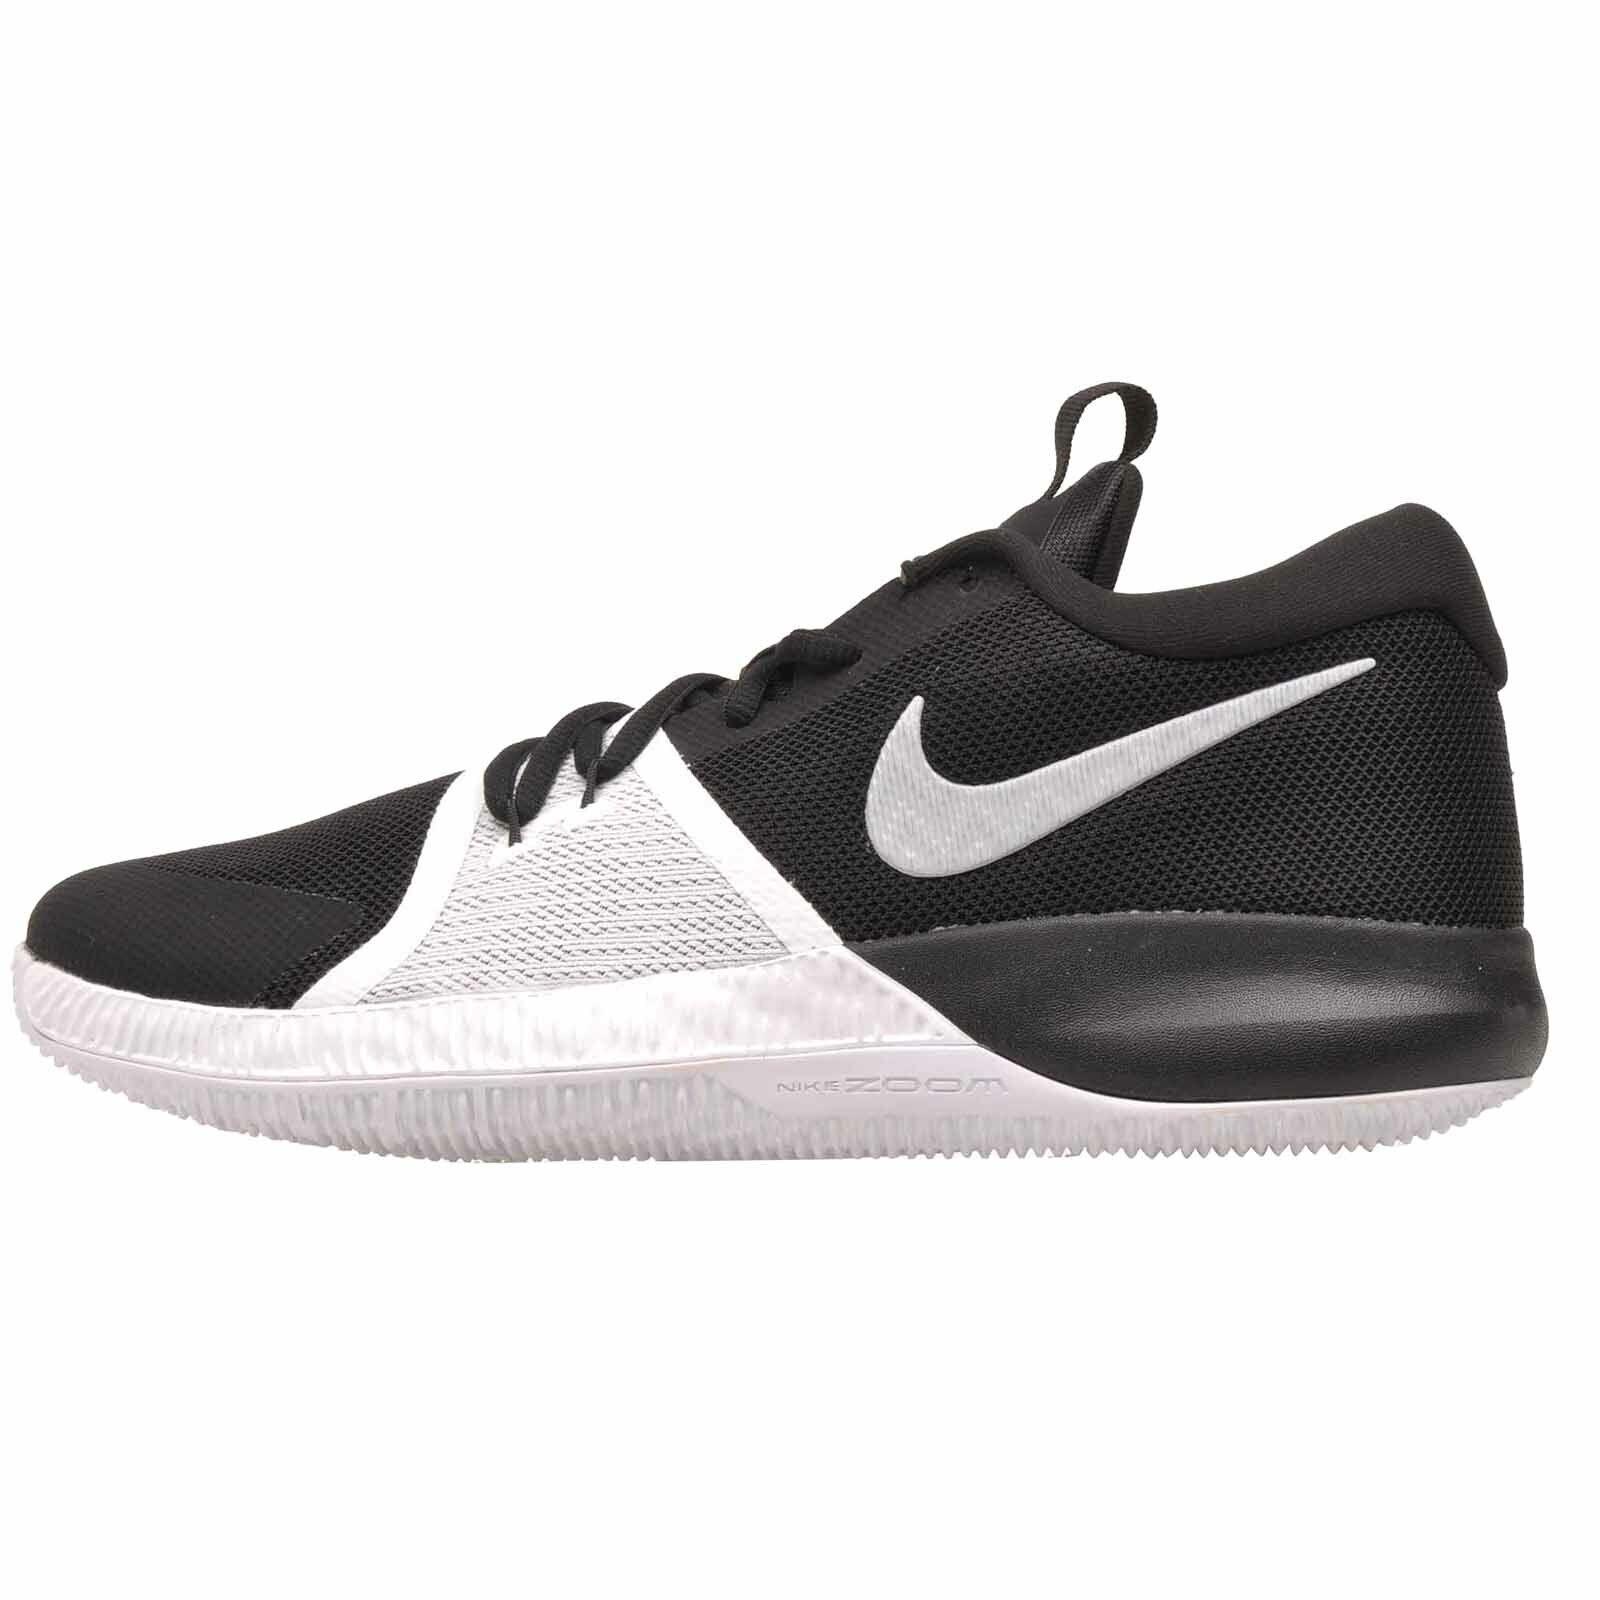 Nike Zoom Assersion (GS) Kids Youth Basketball scarpe nero bianca 918385-001